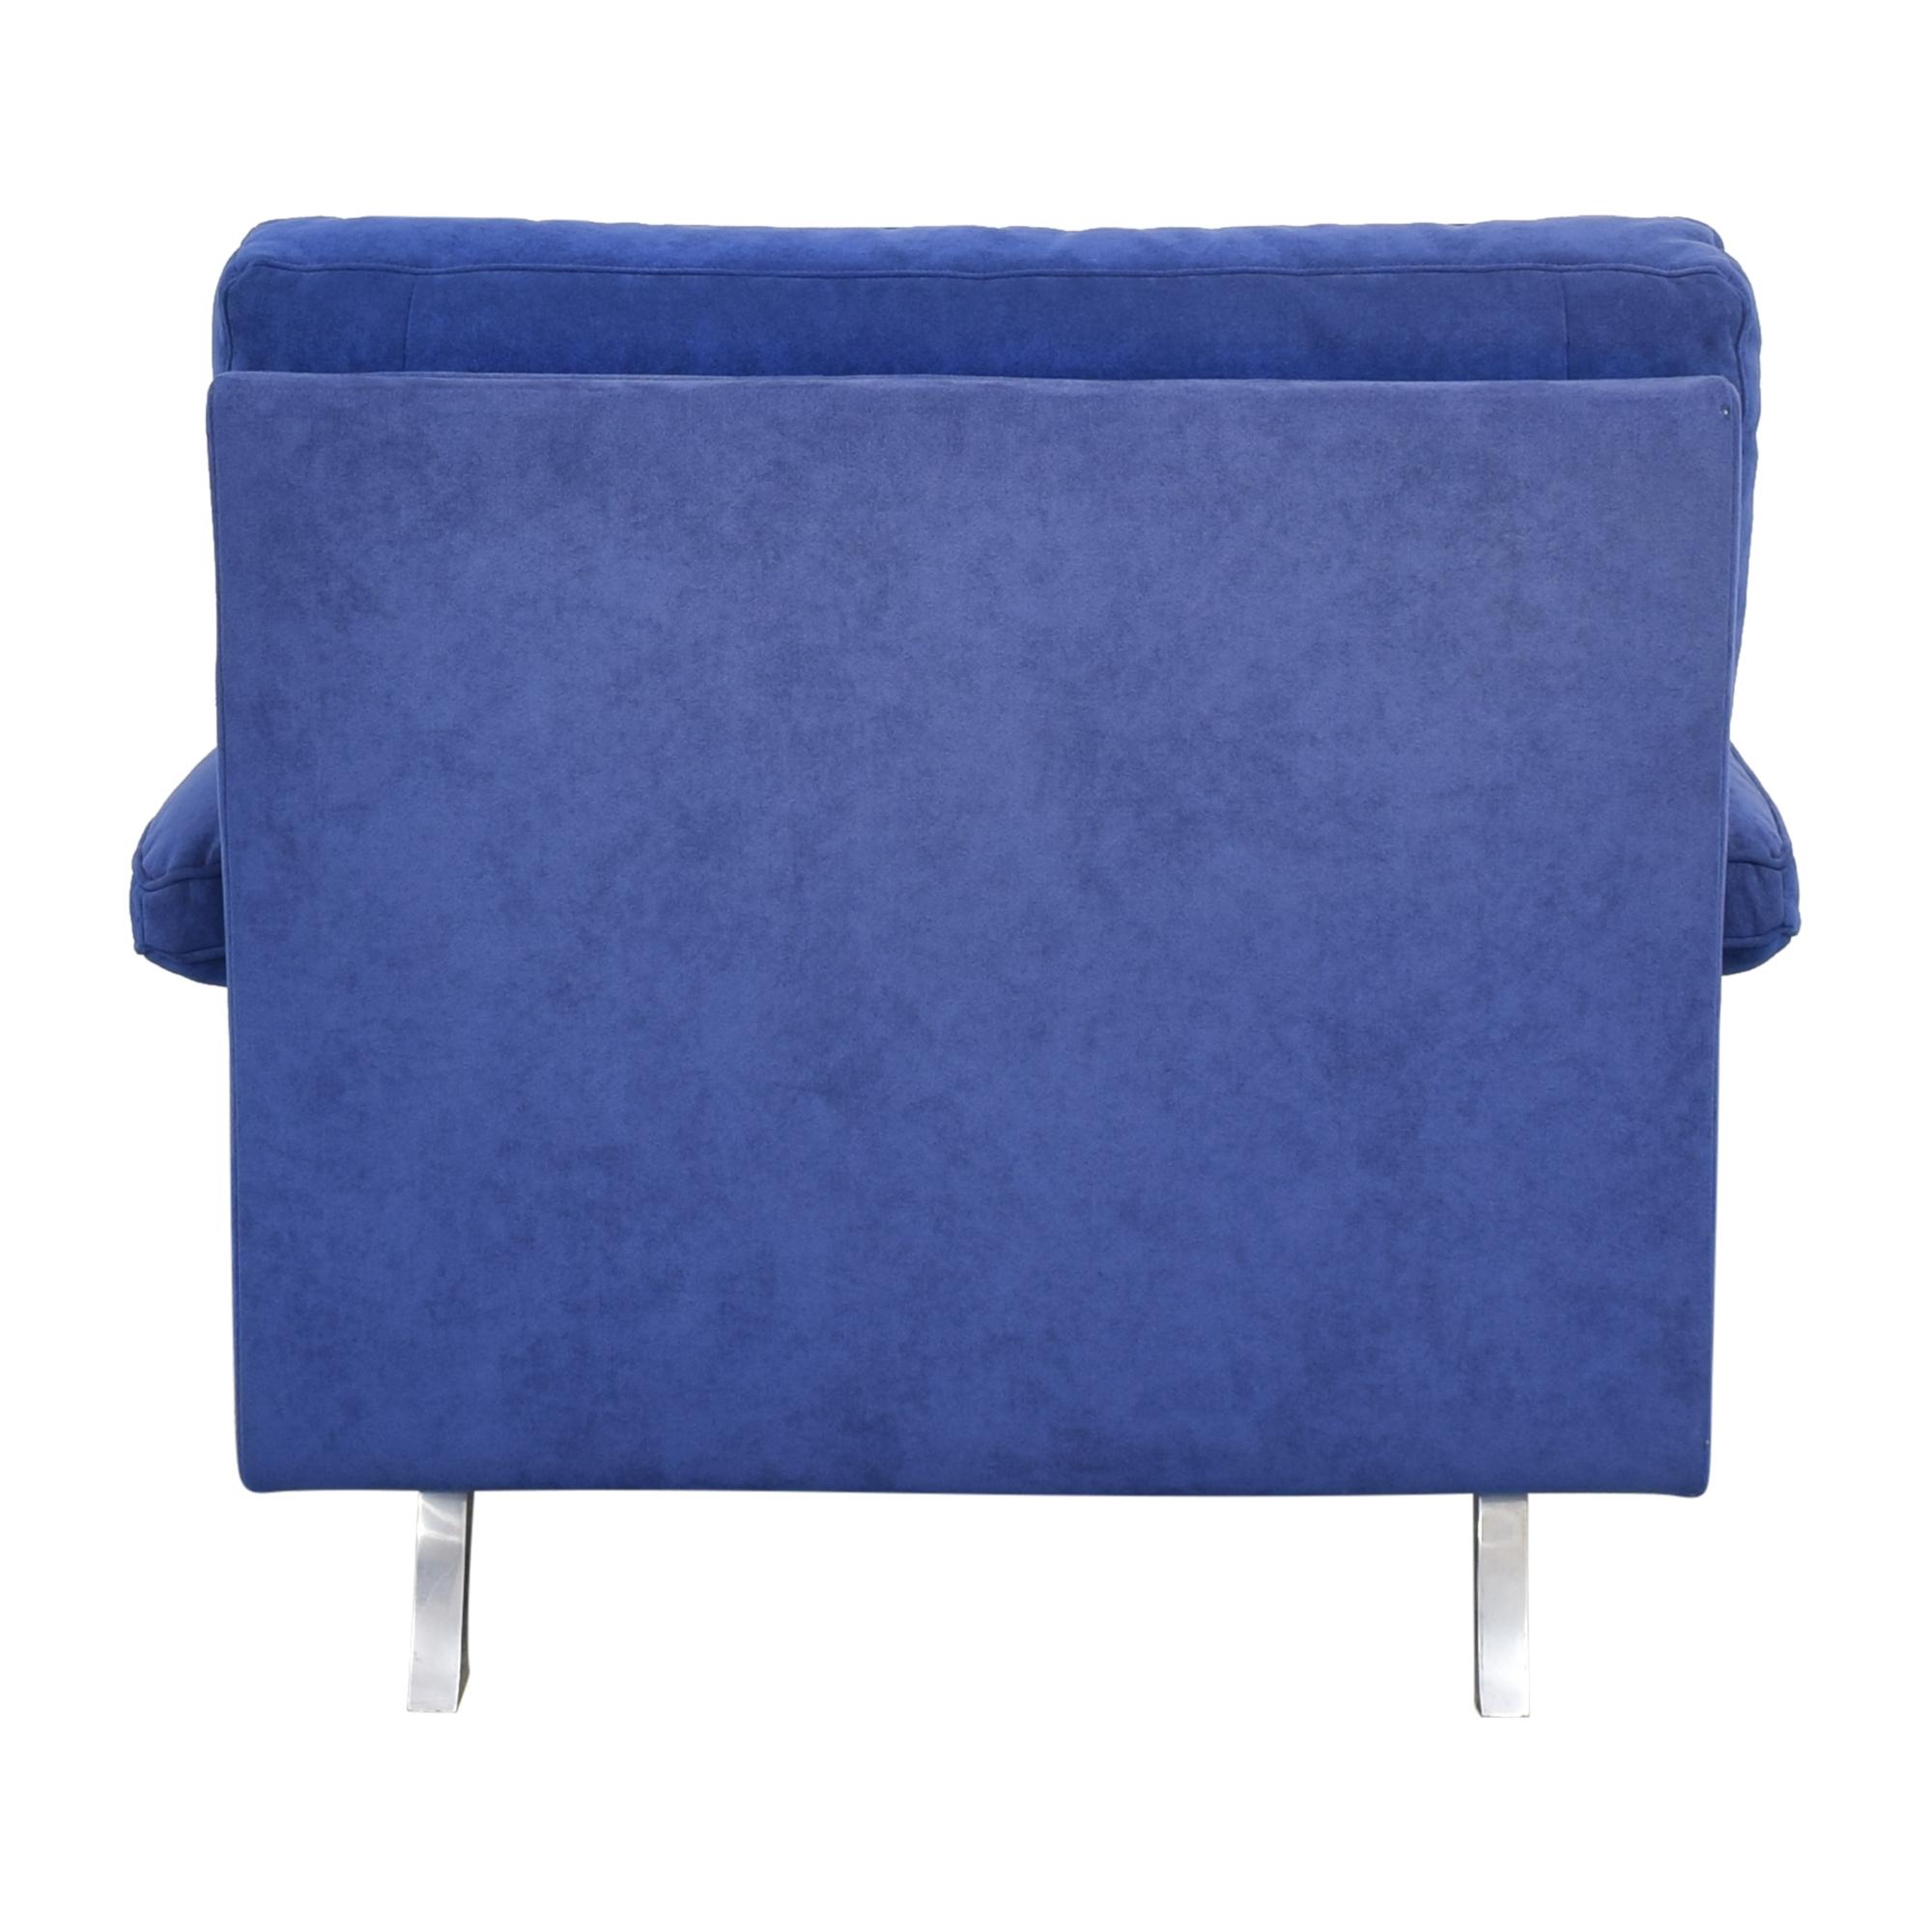 Ligne Roset Ligne Roset Lounge Chair discount